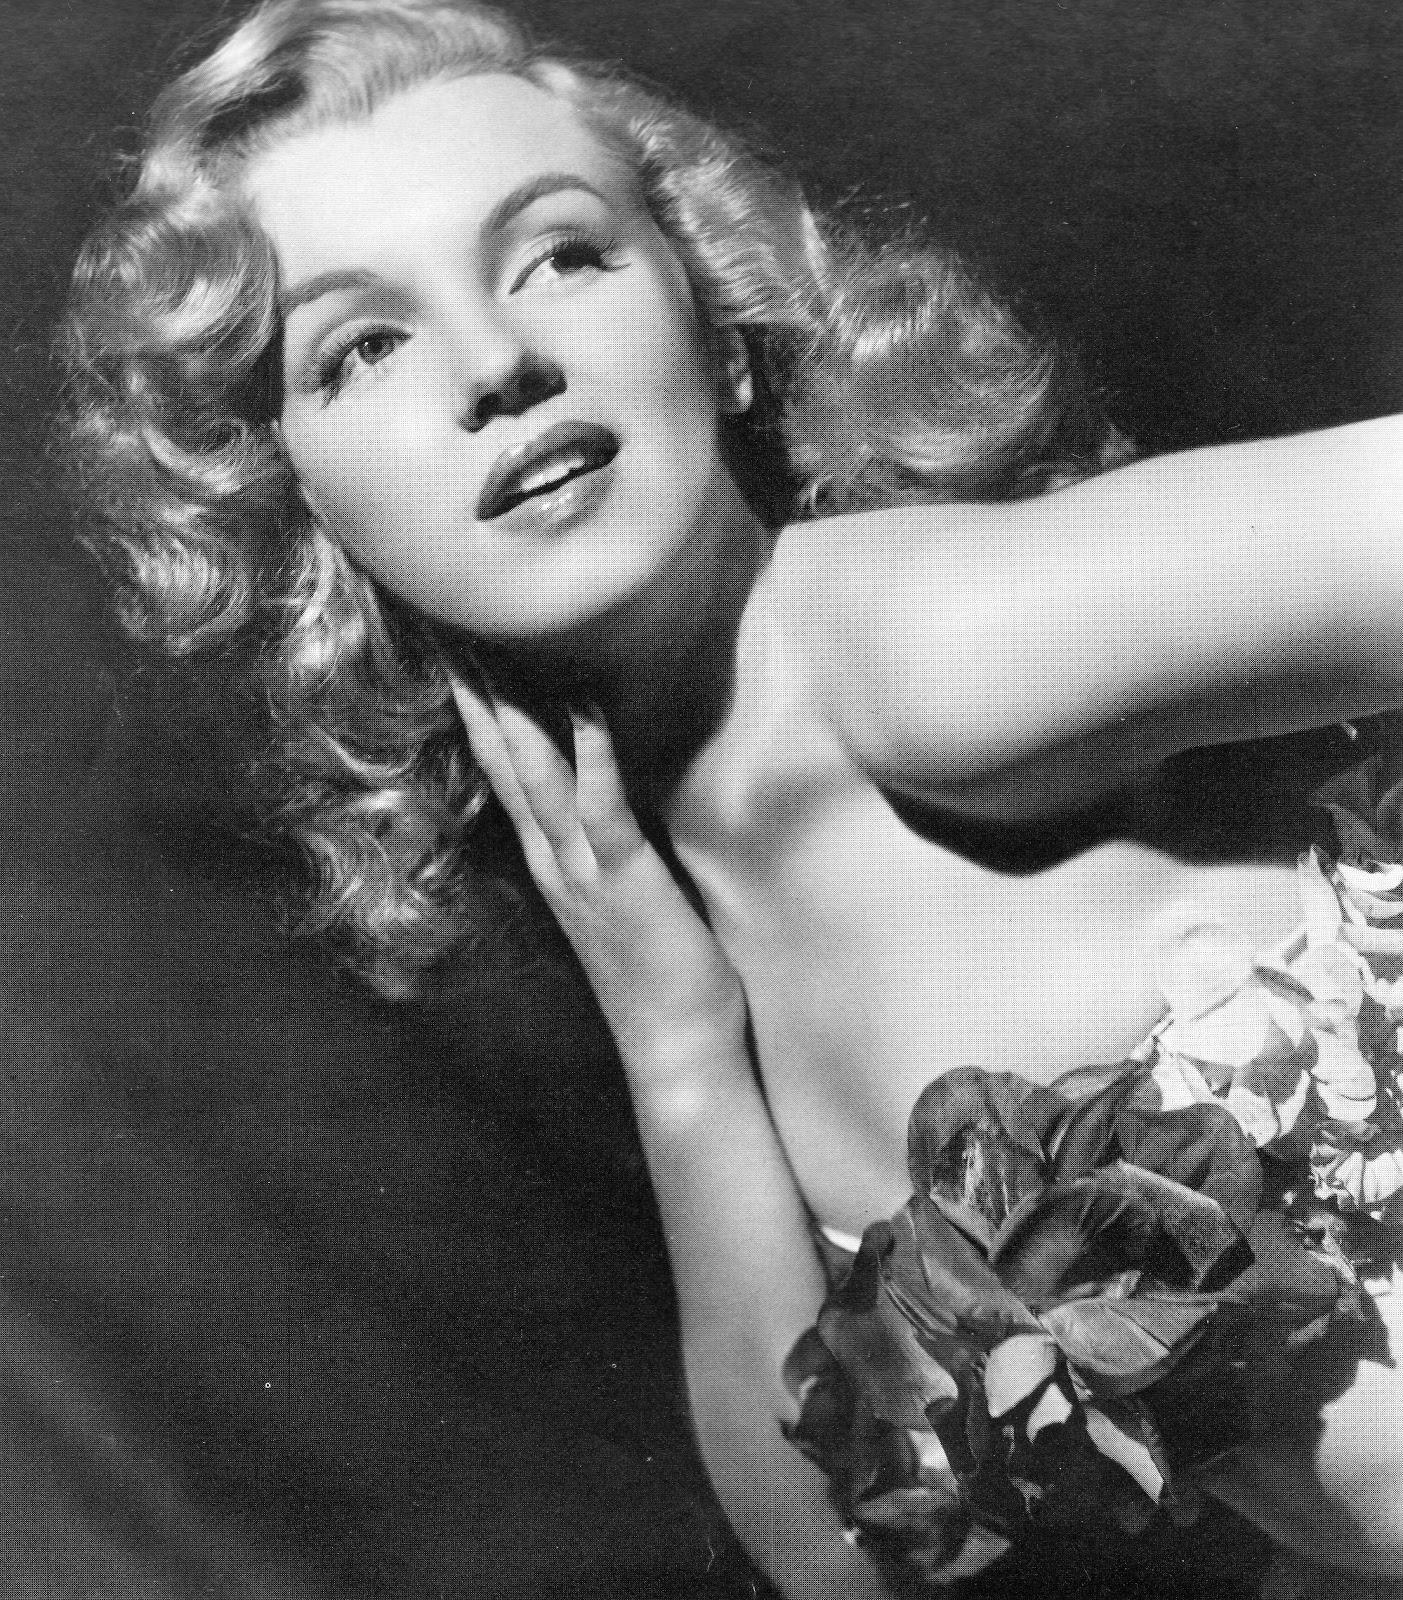 http://4.bp.blogspot.com/-QgdSlgKPbQ0/Terbhw1e3XI/AAAAAAAAB5Q/xQWgw3EqfWA/s1600/Marilyn+Monroe.jpg